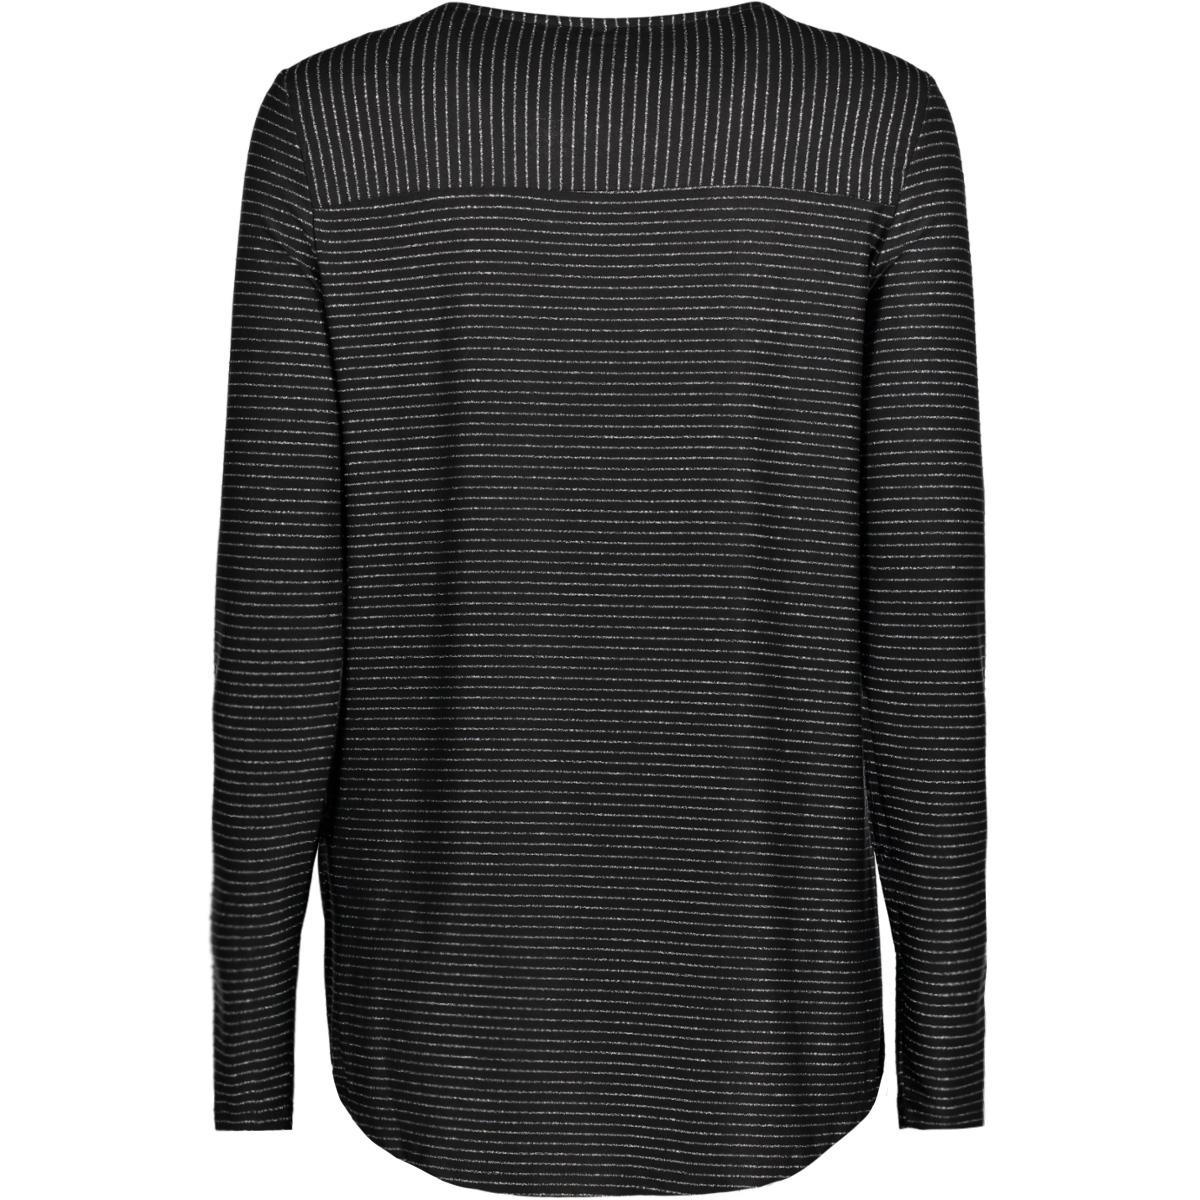 vmhaley l/s top jrs 10189408 vero moda t-shirt black / w / silver